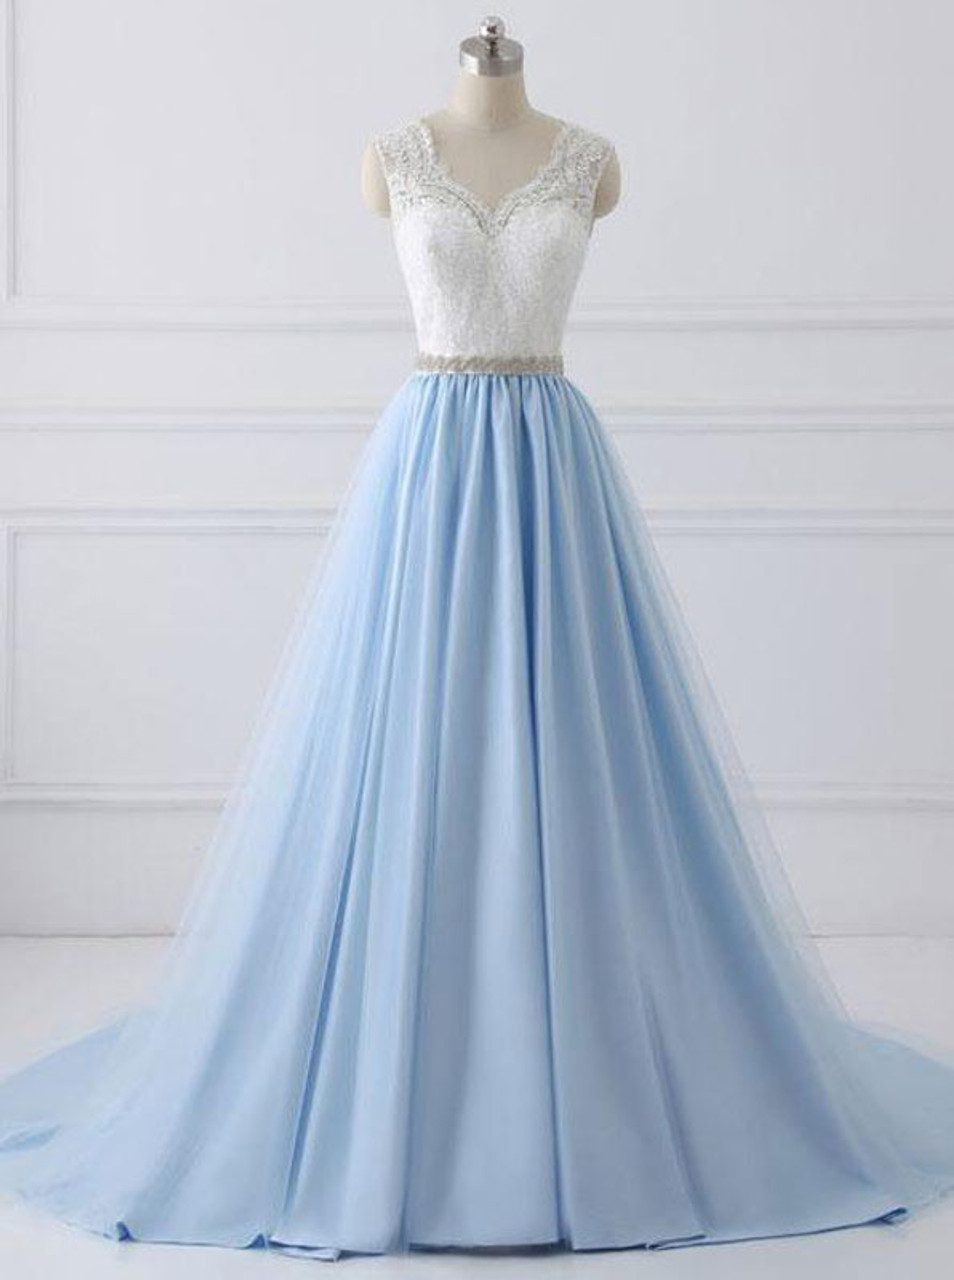 6c2085eead A-line Modest Prom Dresses